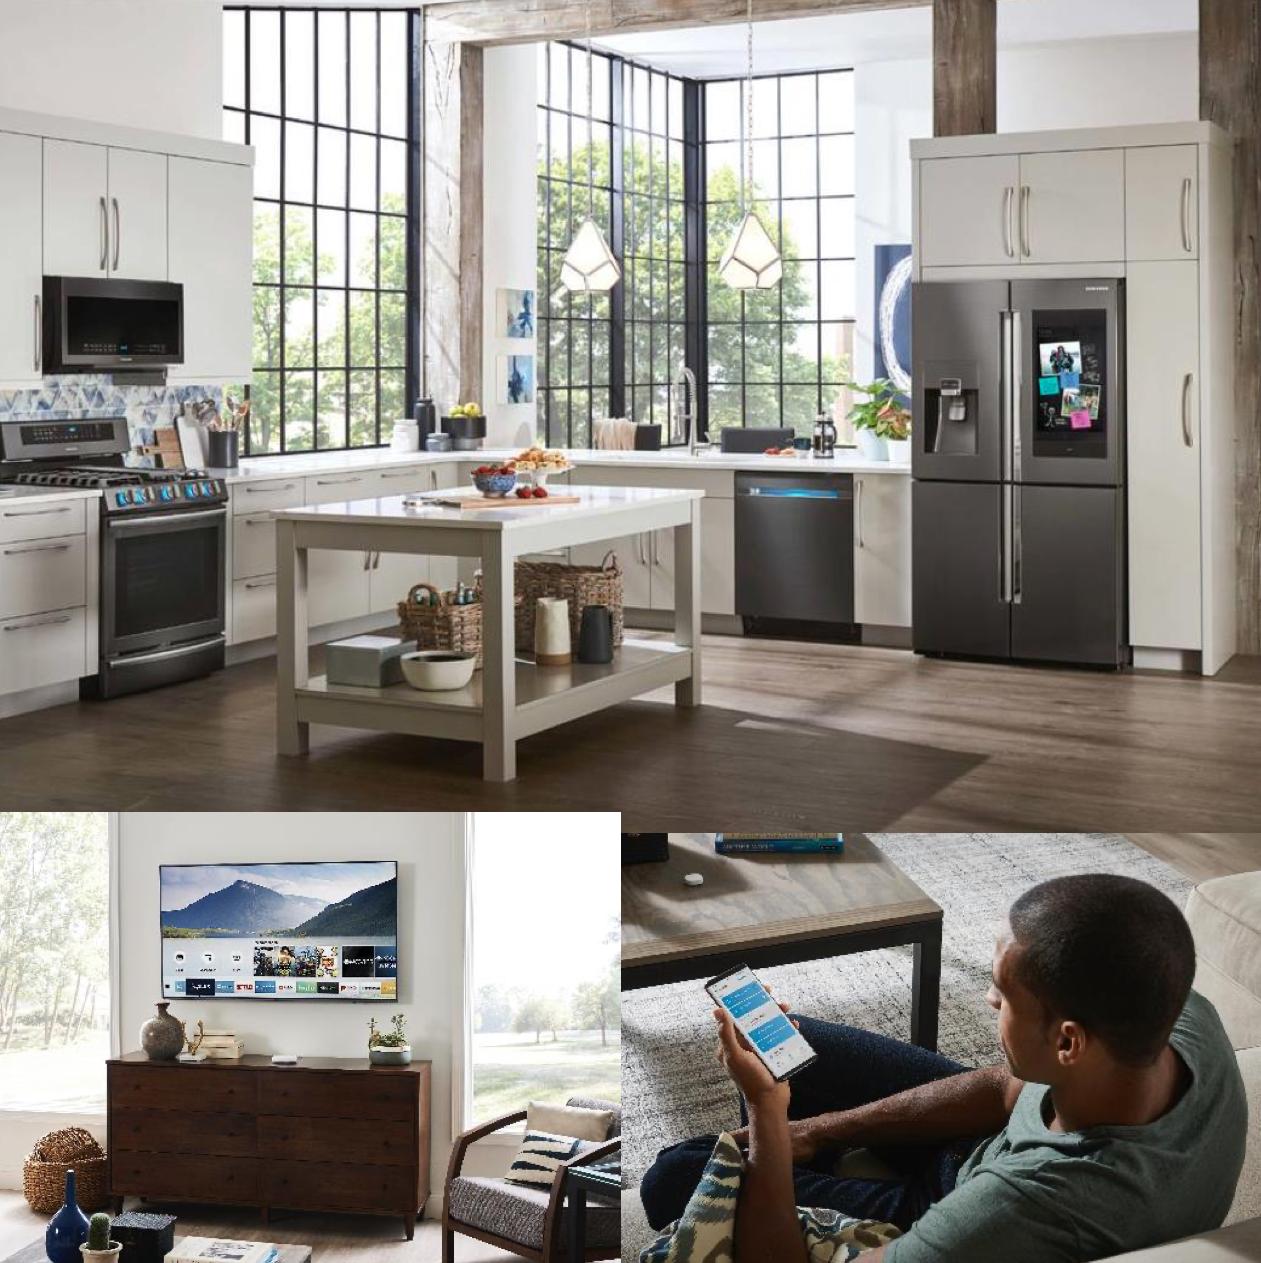 Samsung Smart Luxury Beauty Appliances at Virtual PrimeTime